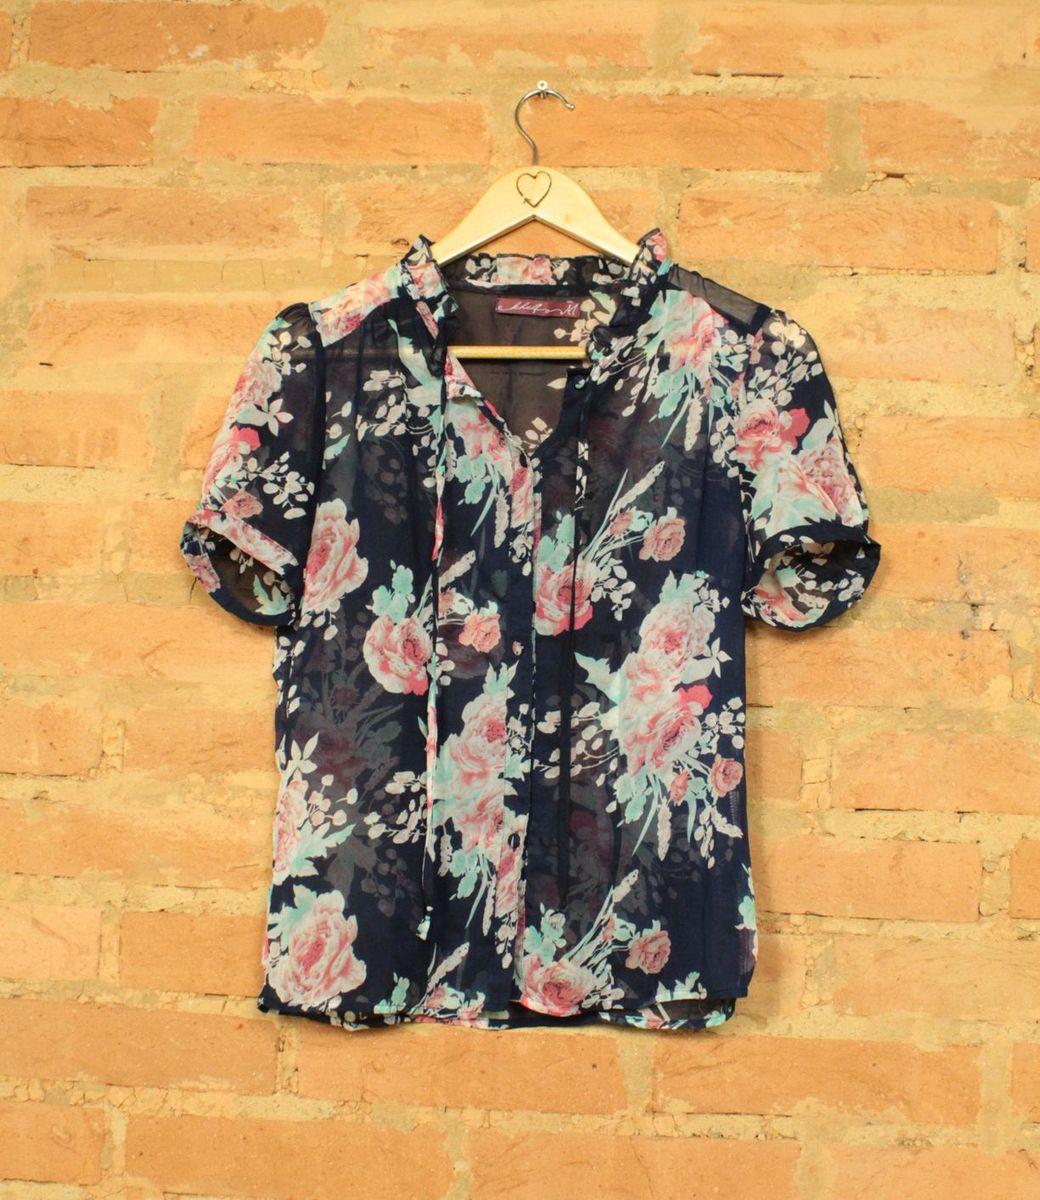 camisa khelf floral - camisas khelf